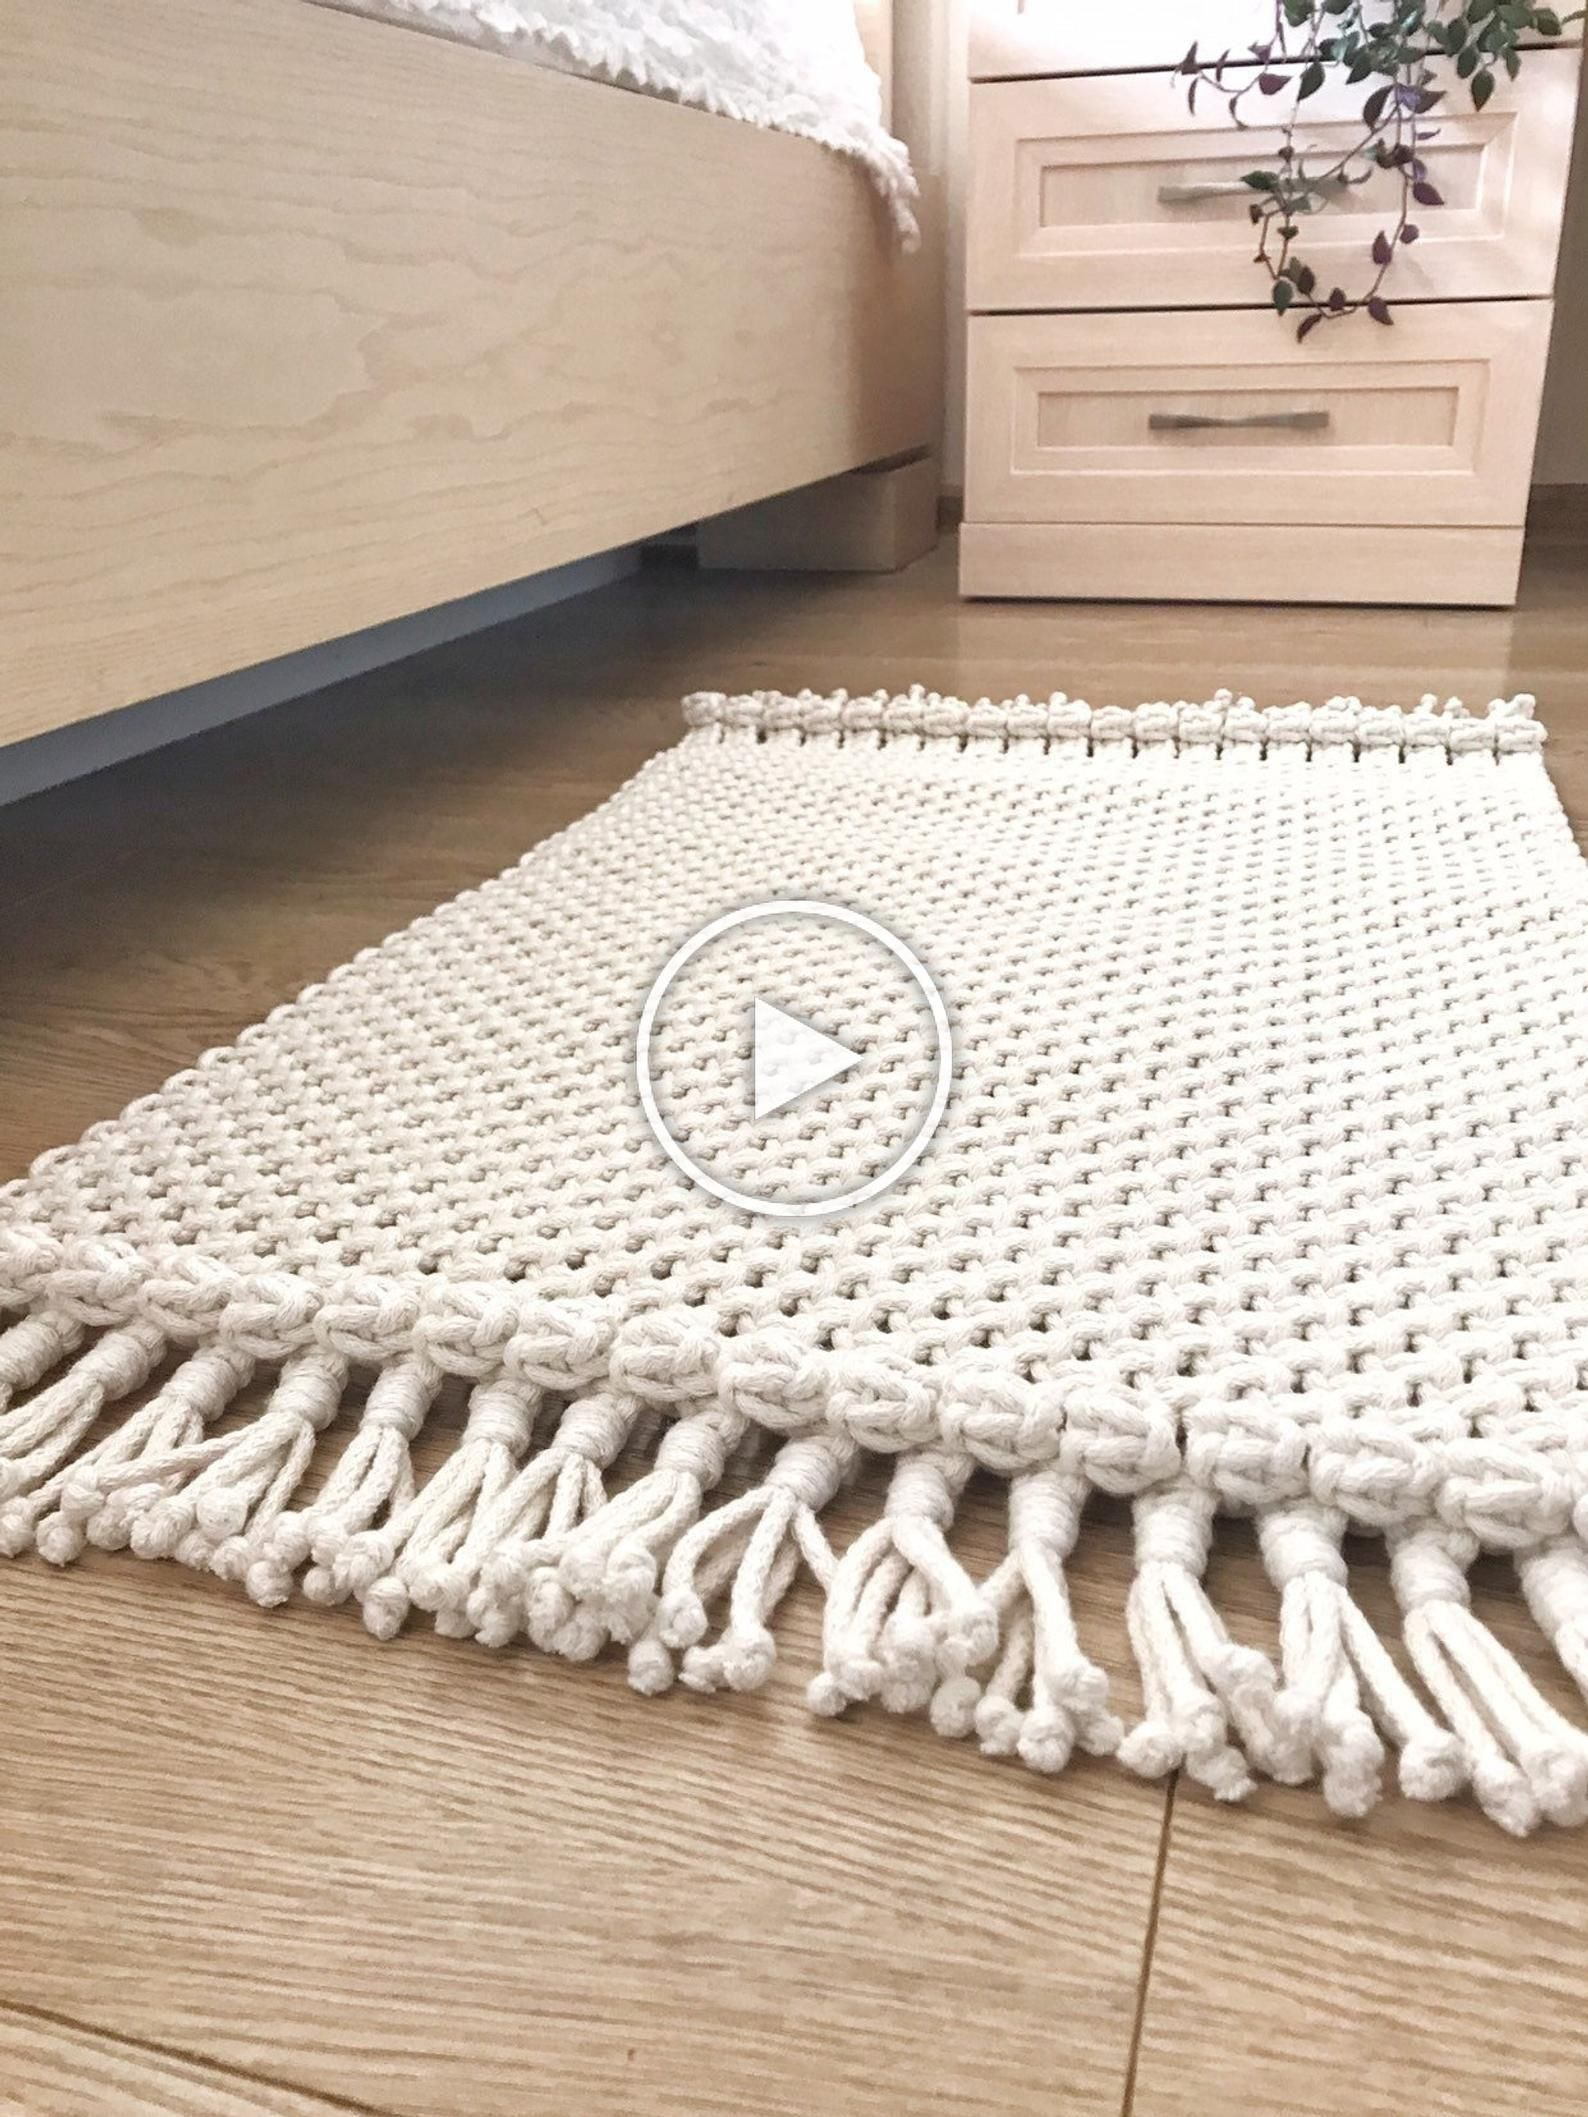 Macrame Carpet Mawgie | Diy rug, Macrame design, Bohemian